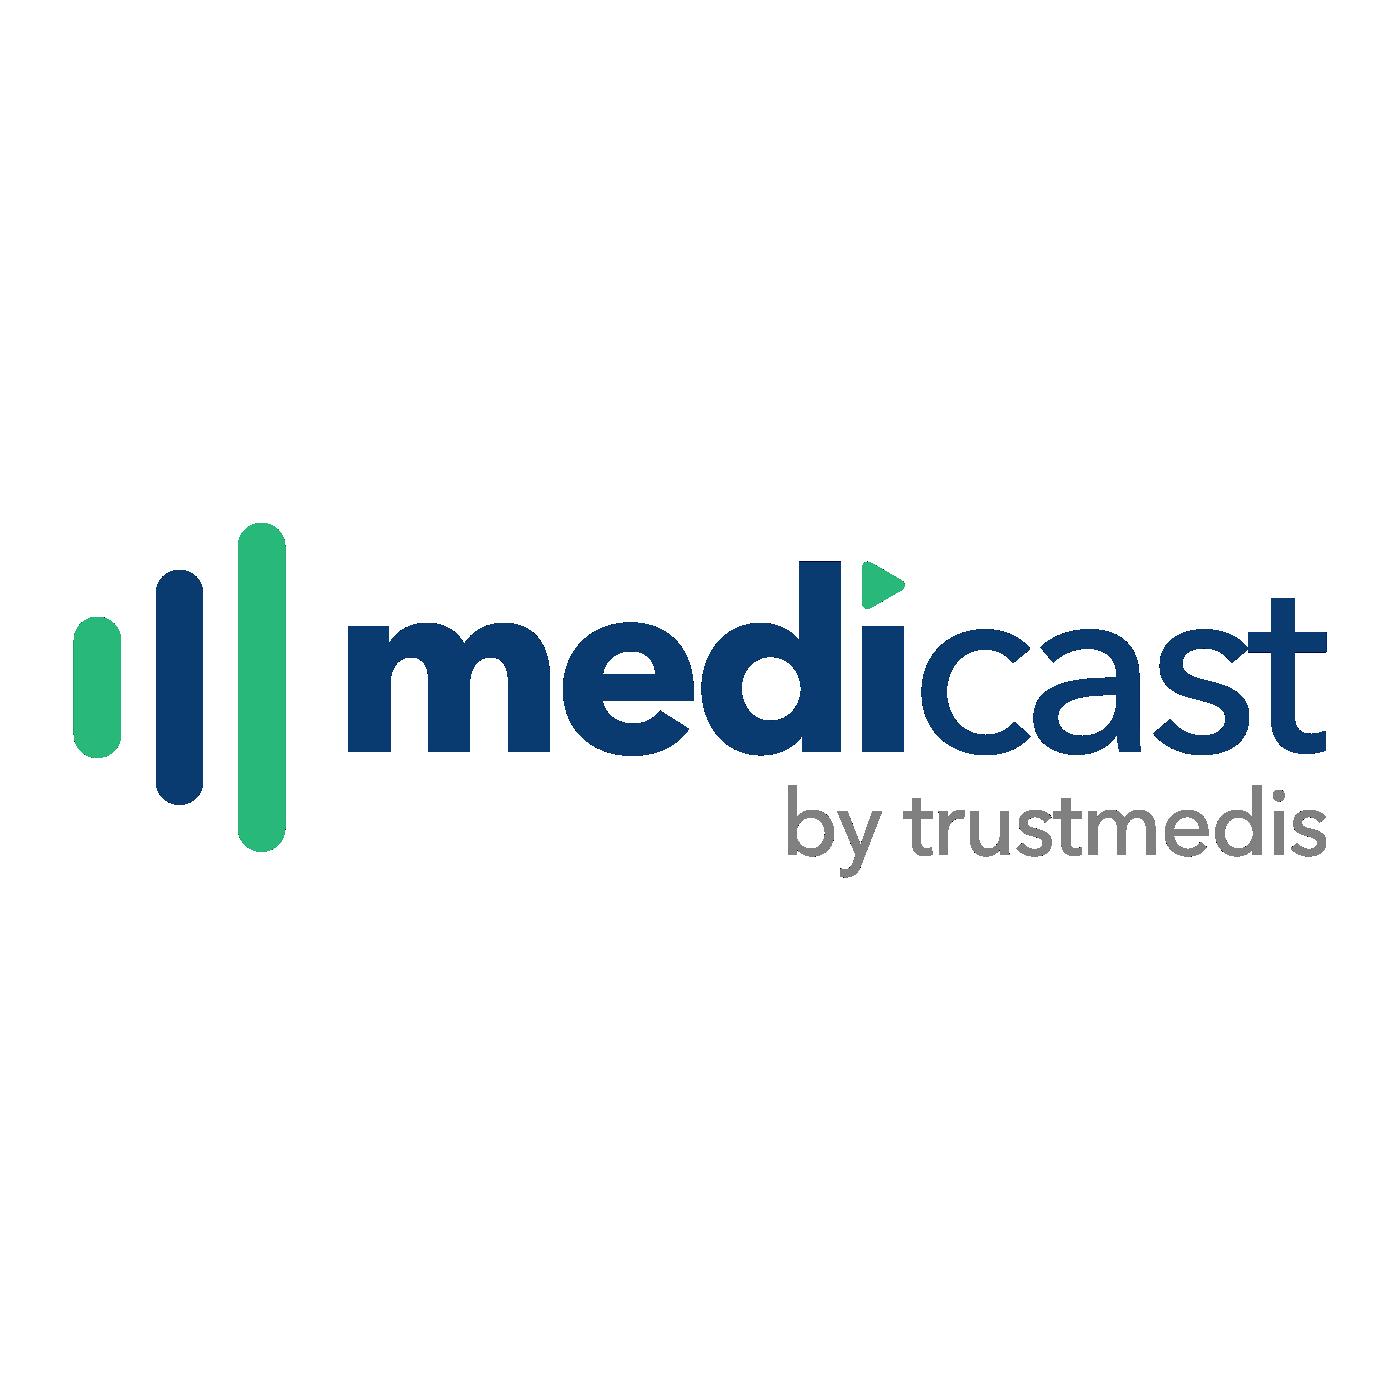 Medicast by trustmedis